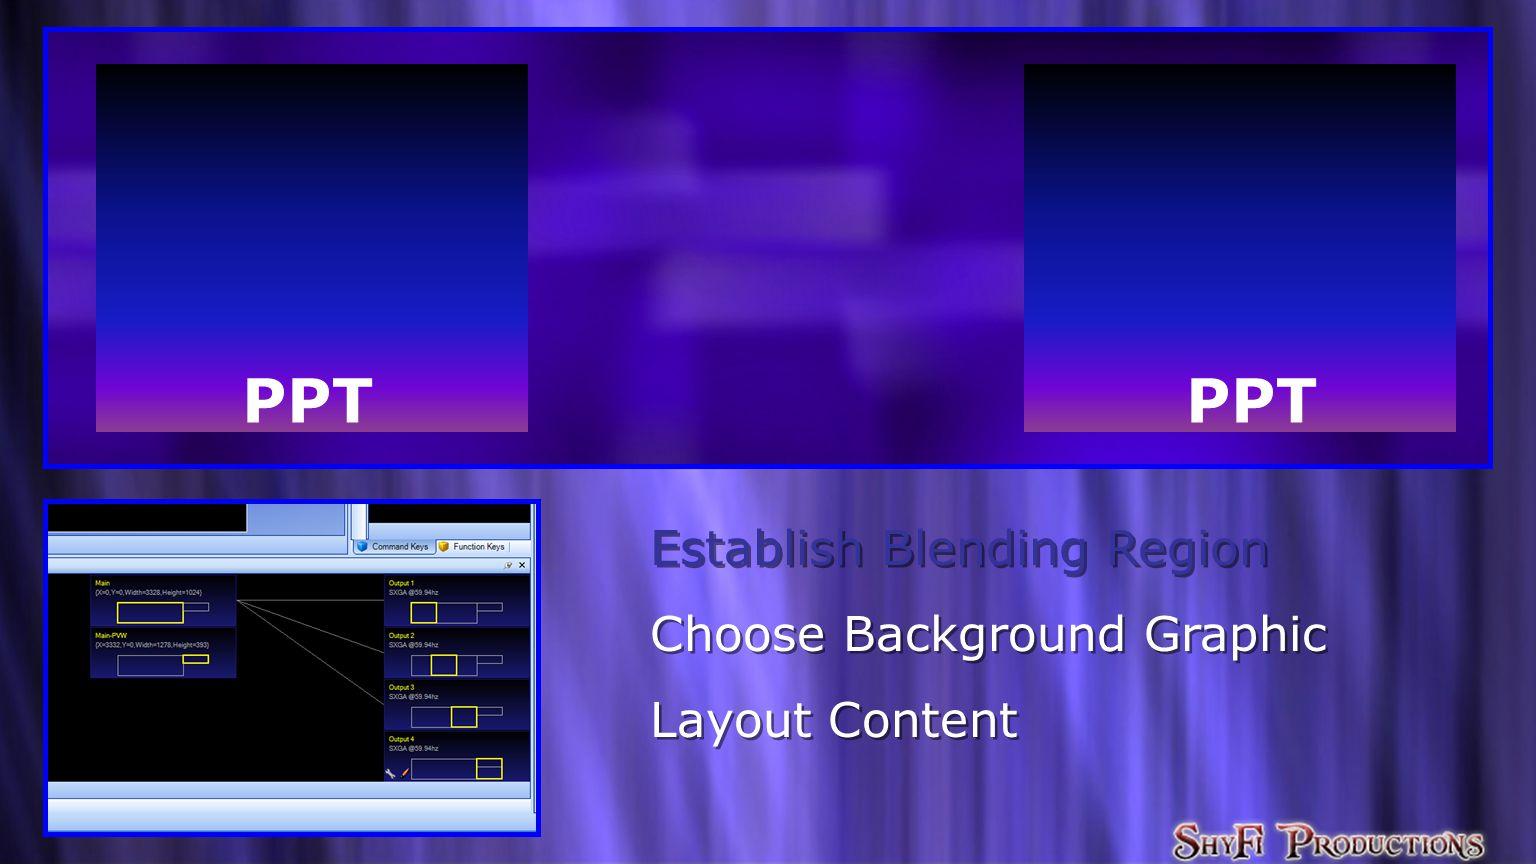 Establish Blending Region Choose Background Graphic Layout Content Establish Blending Region Choose Background Graphic Layout Content PPT